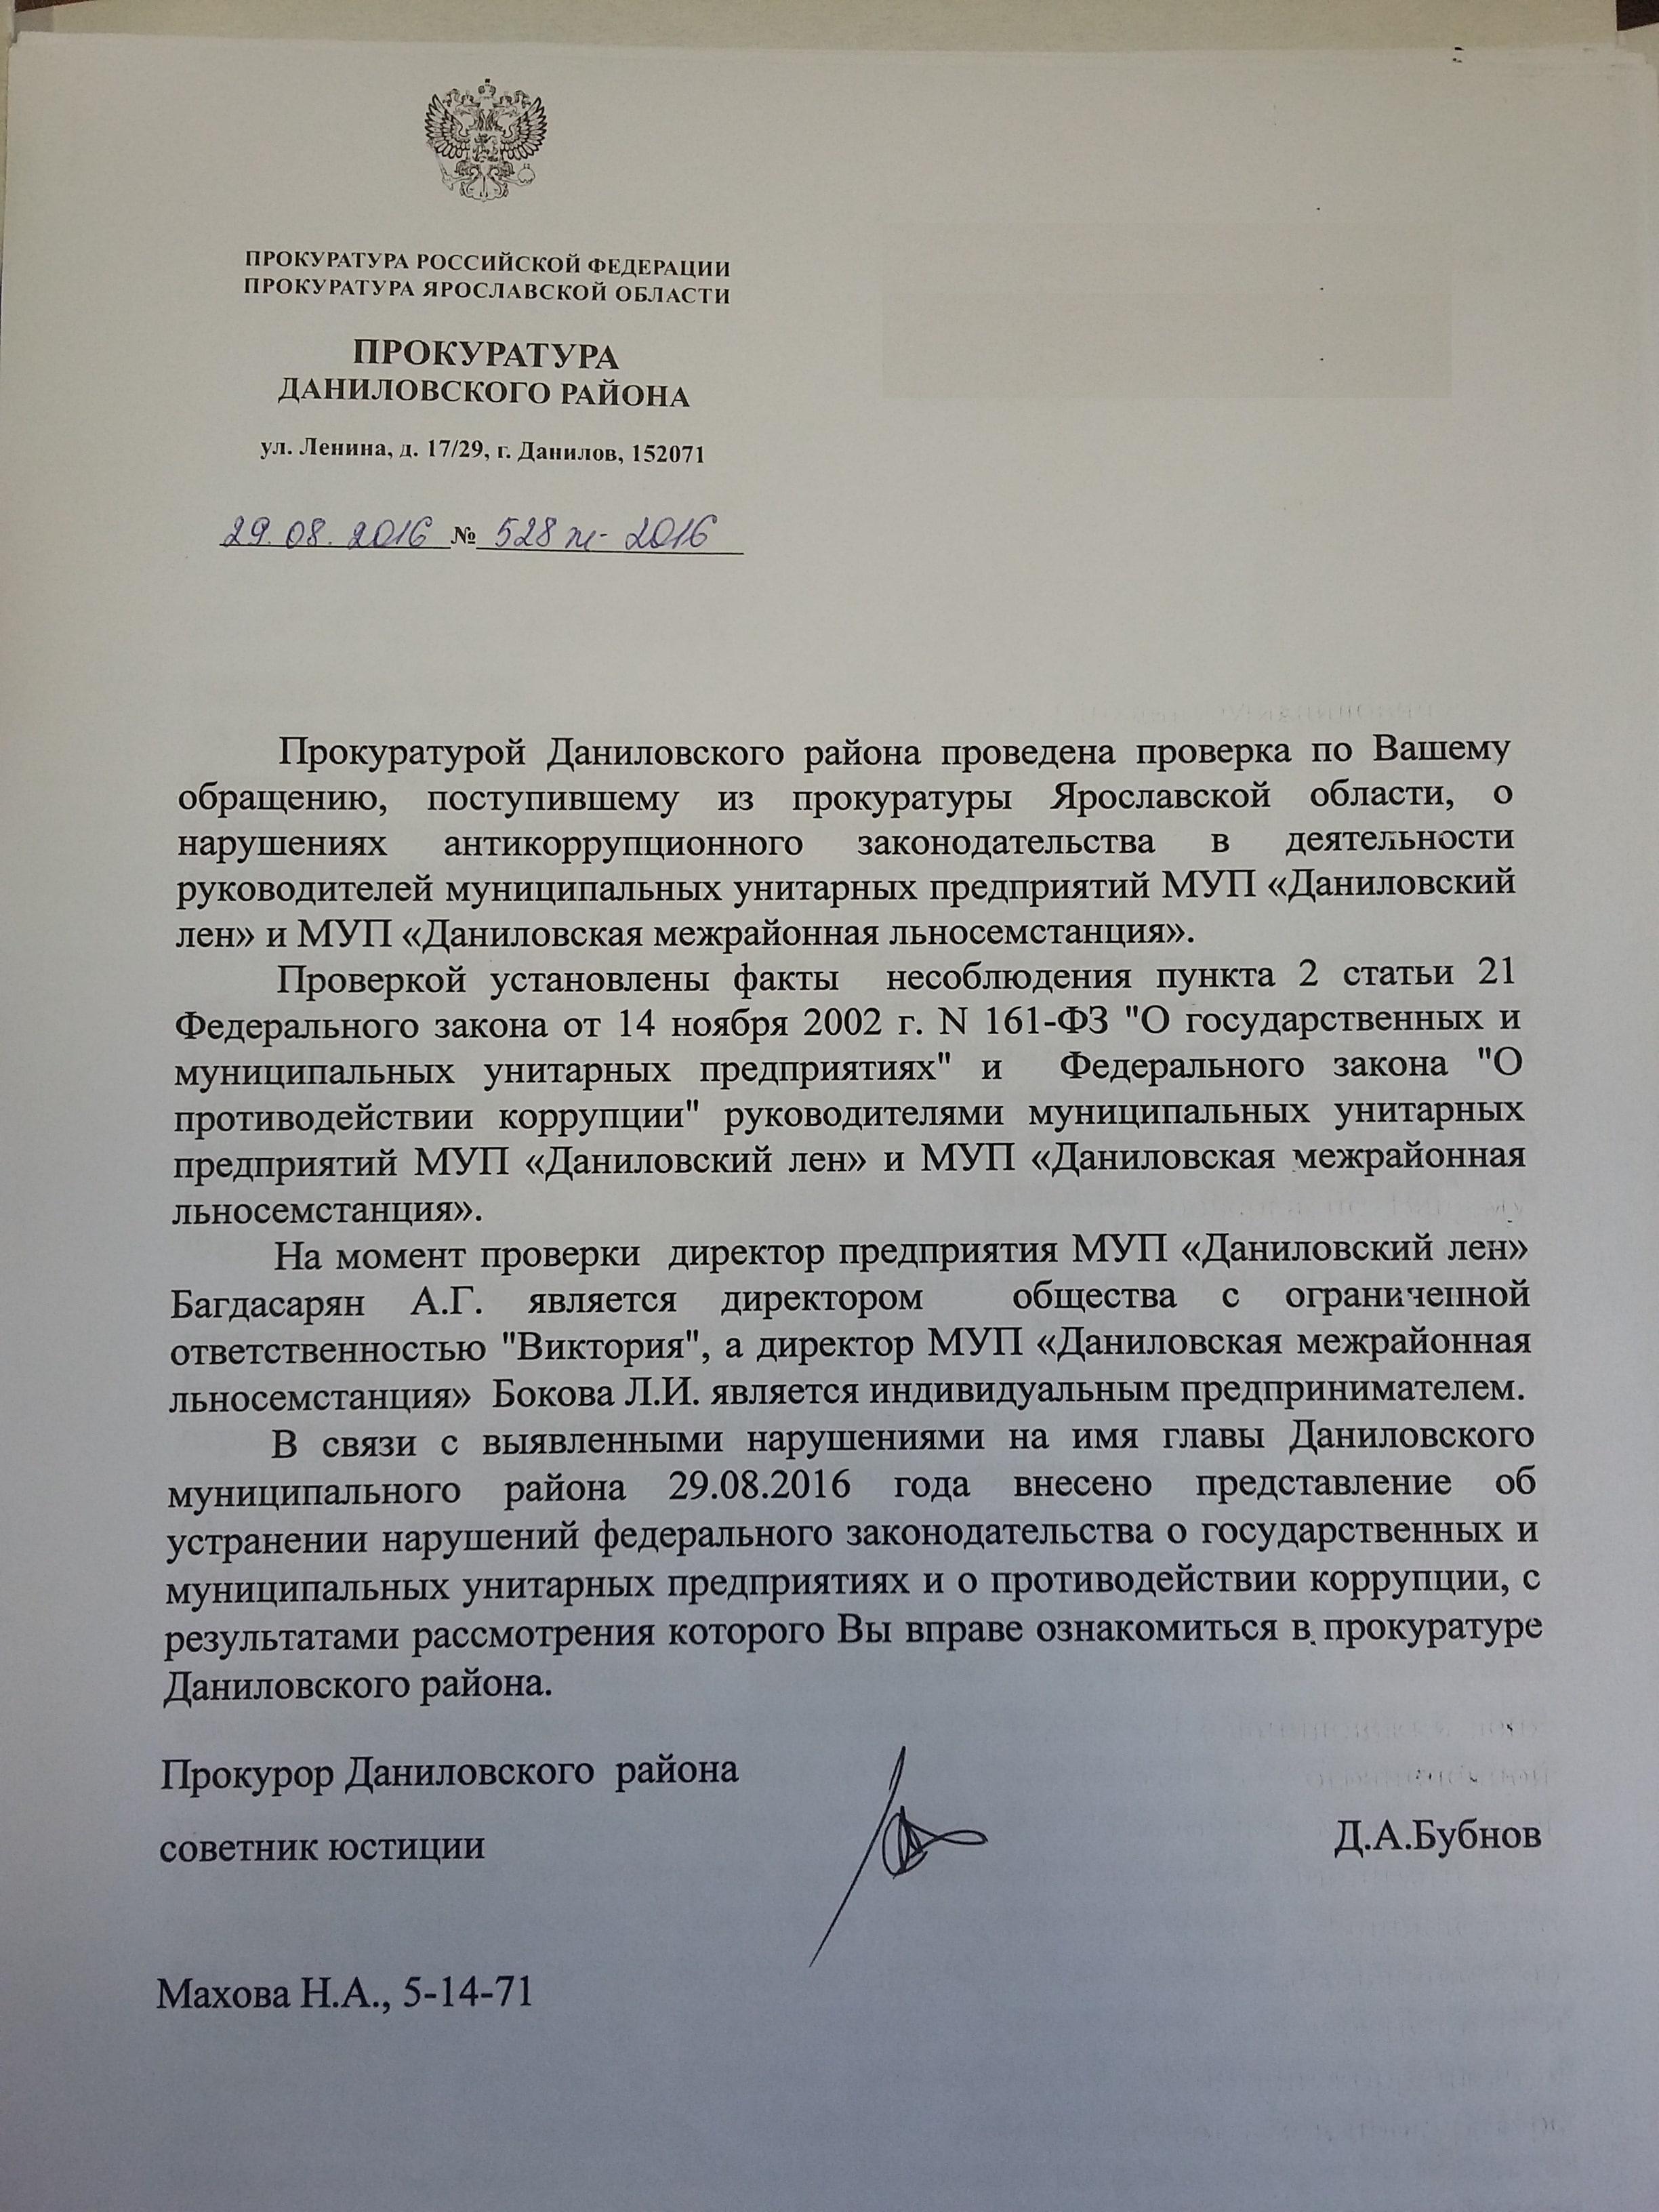 Прокуратура Даниловского района1